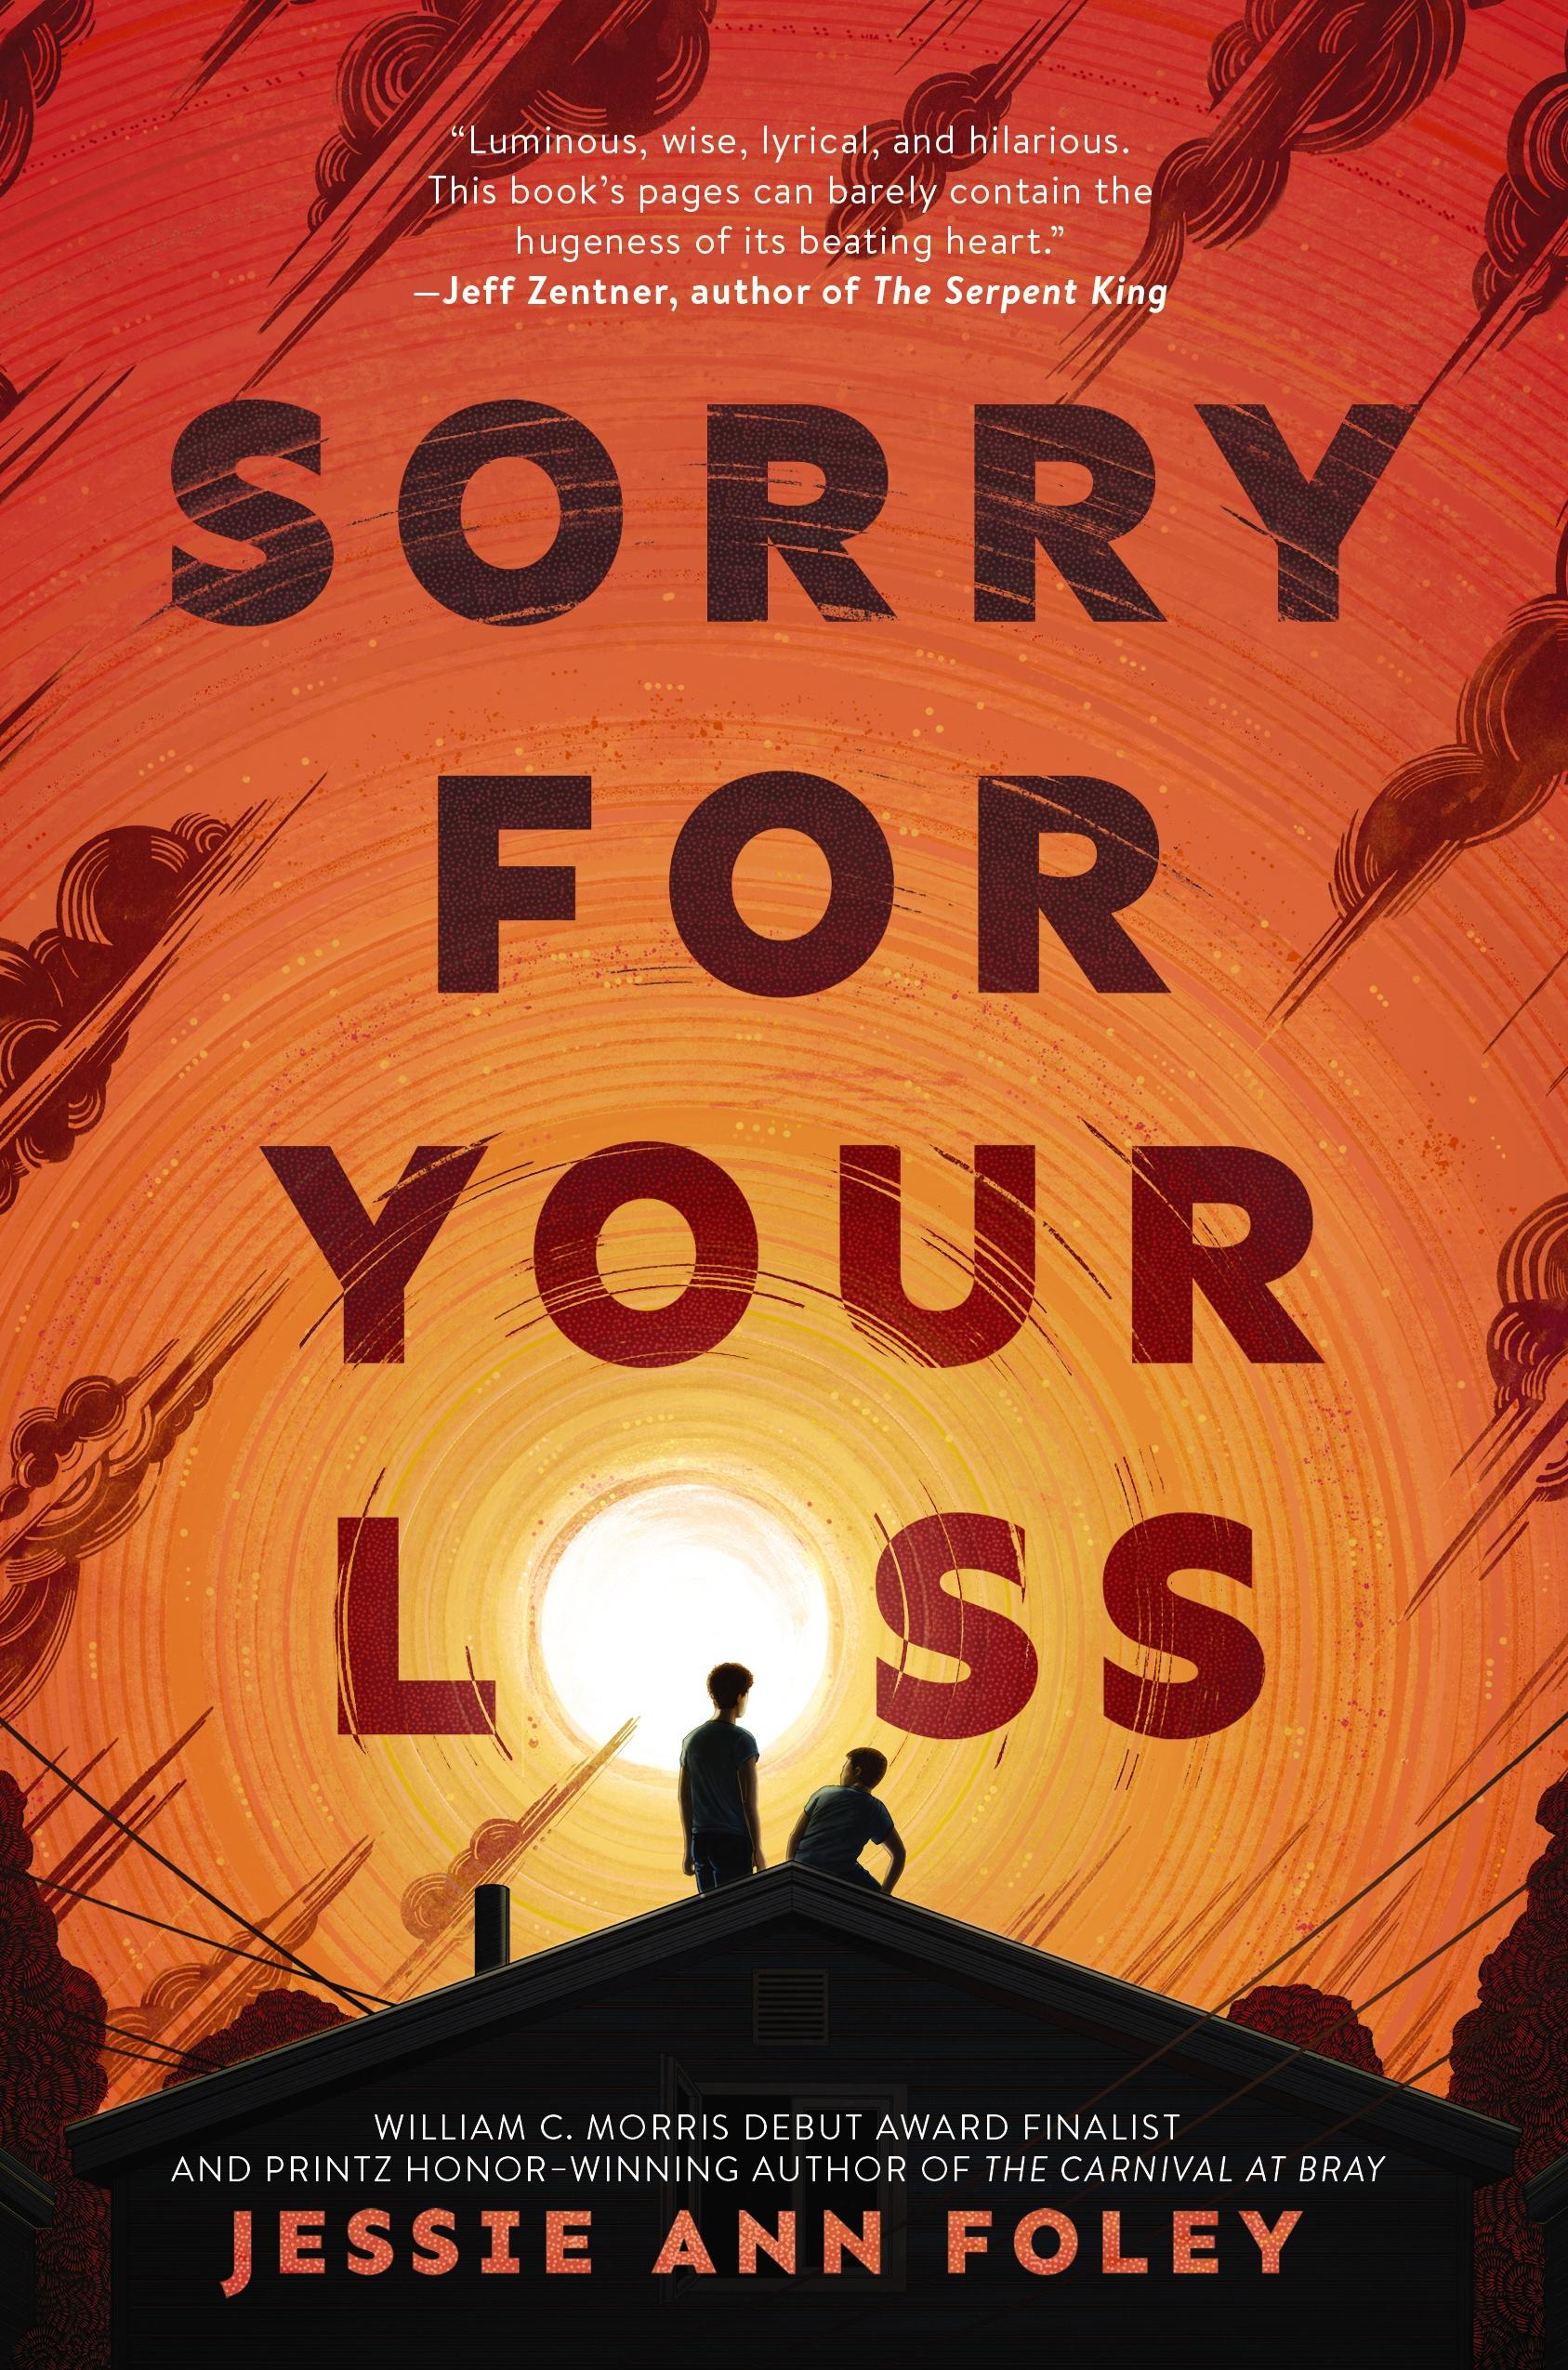 Foley Book Cover.JPG